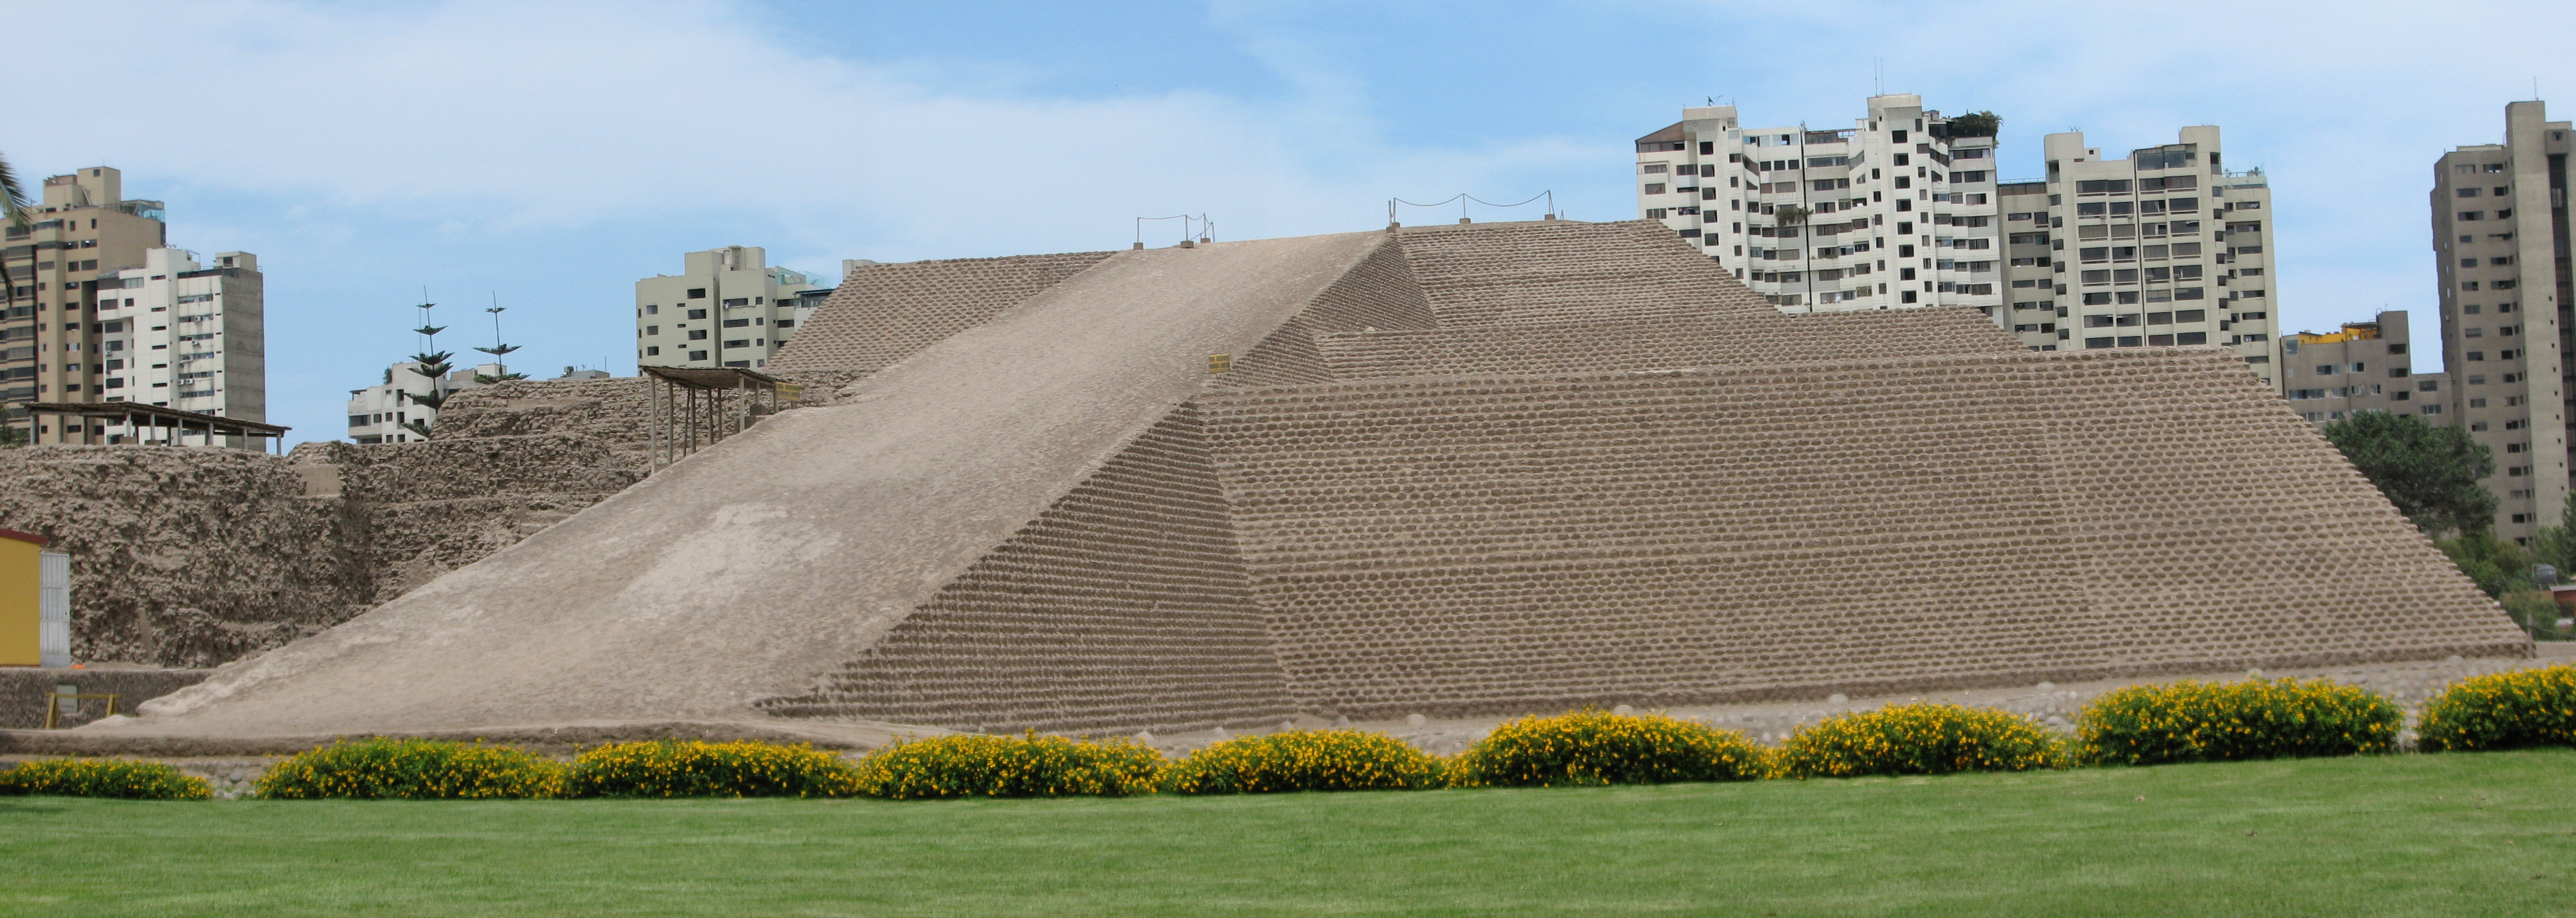 Visit the Huaca Huallamarca Archaeological site